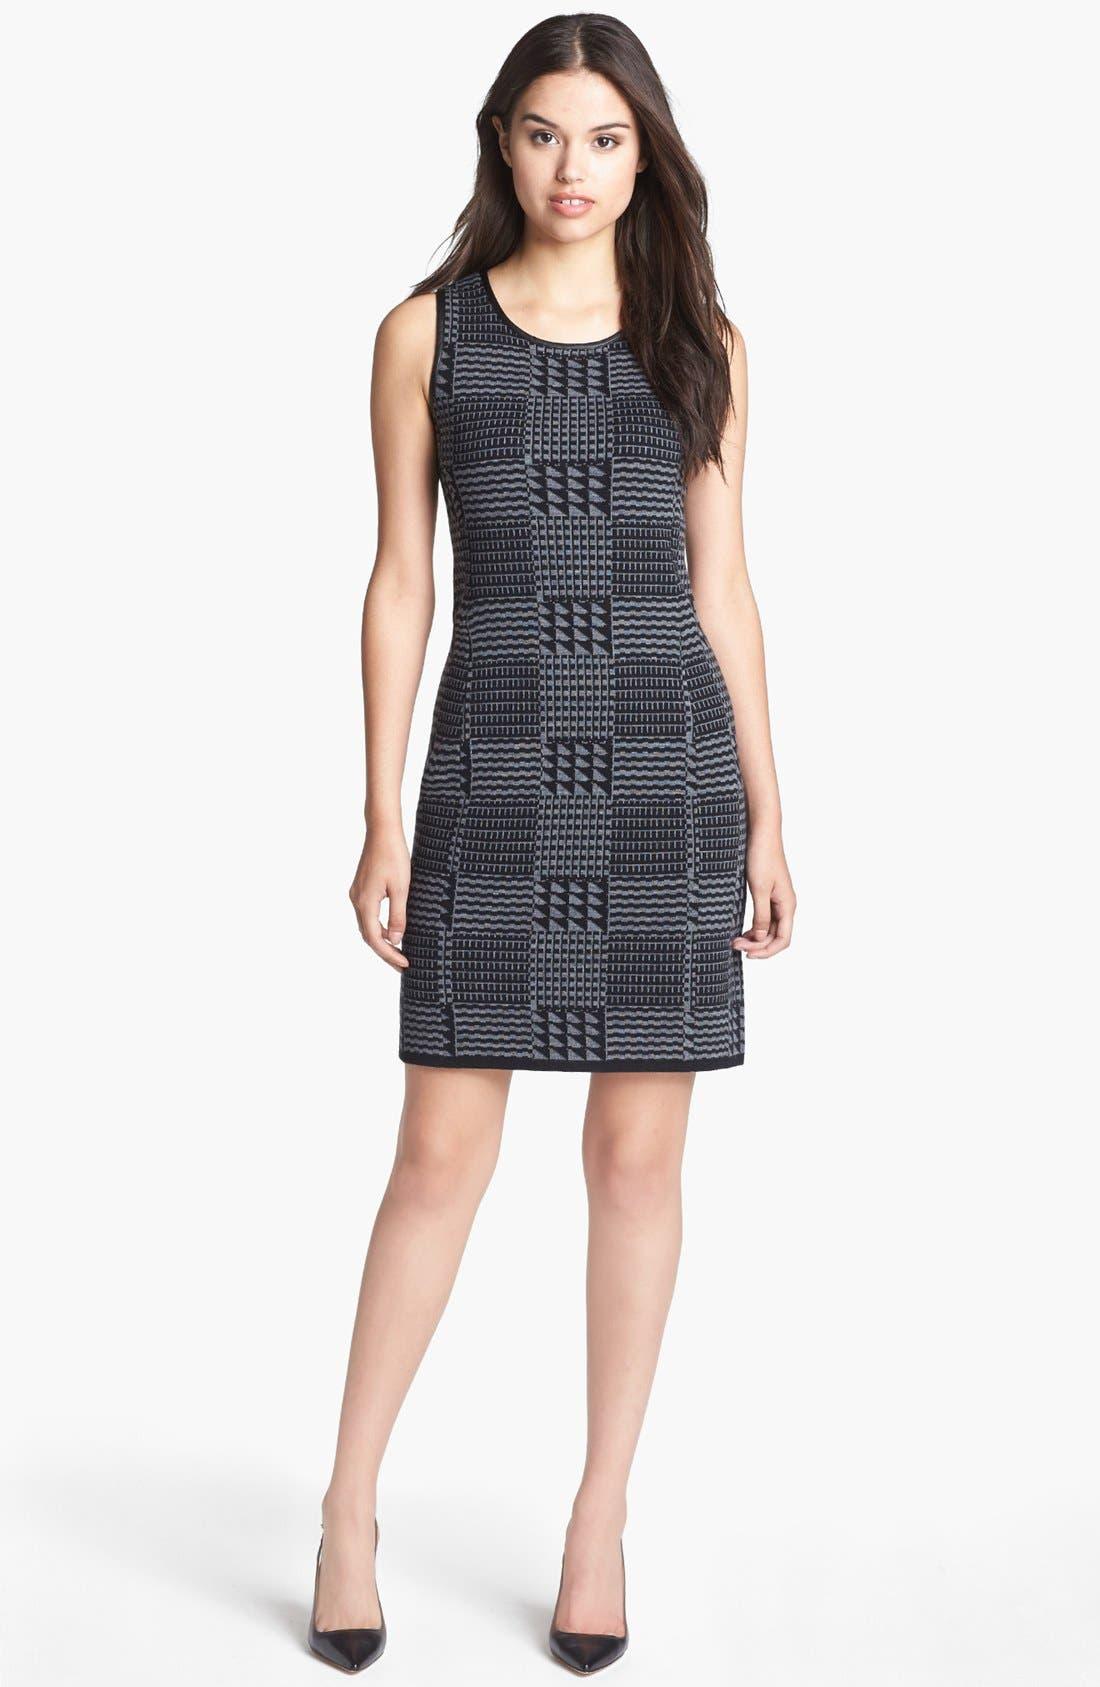 Alternate Image 1 Selected - Halogen® Faux Leather Trim Knit Sheath Dress